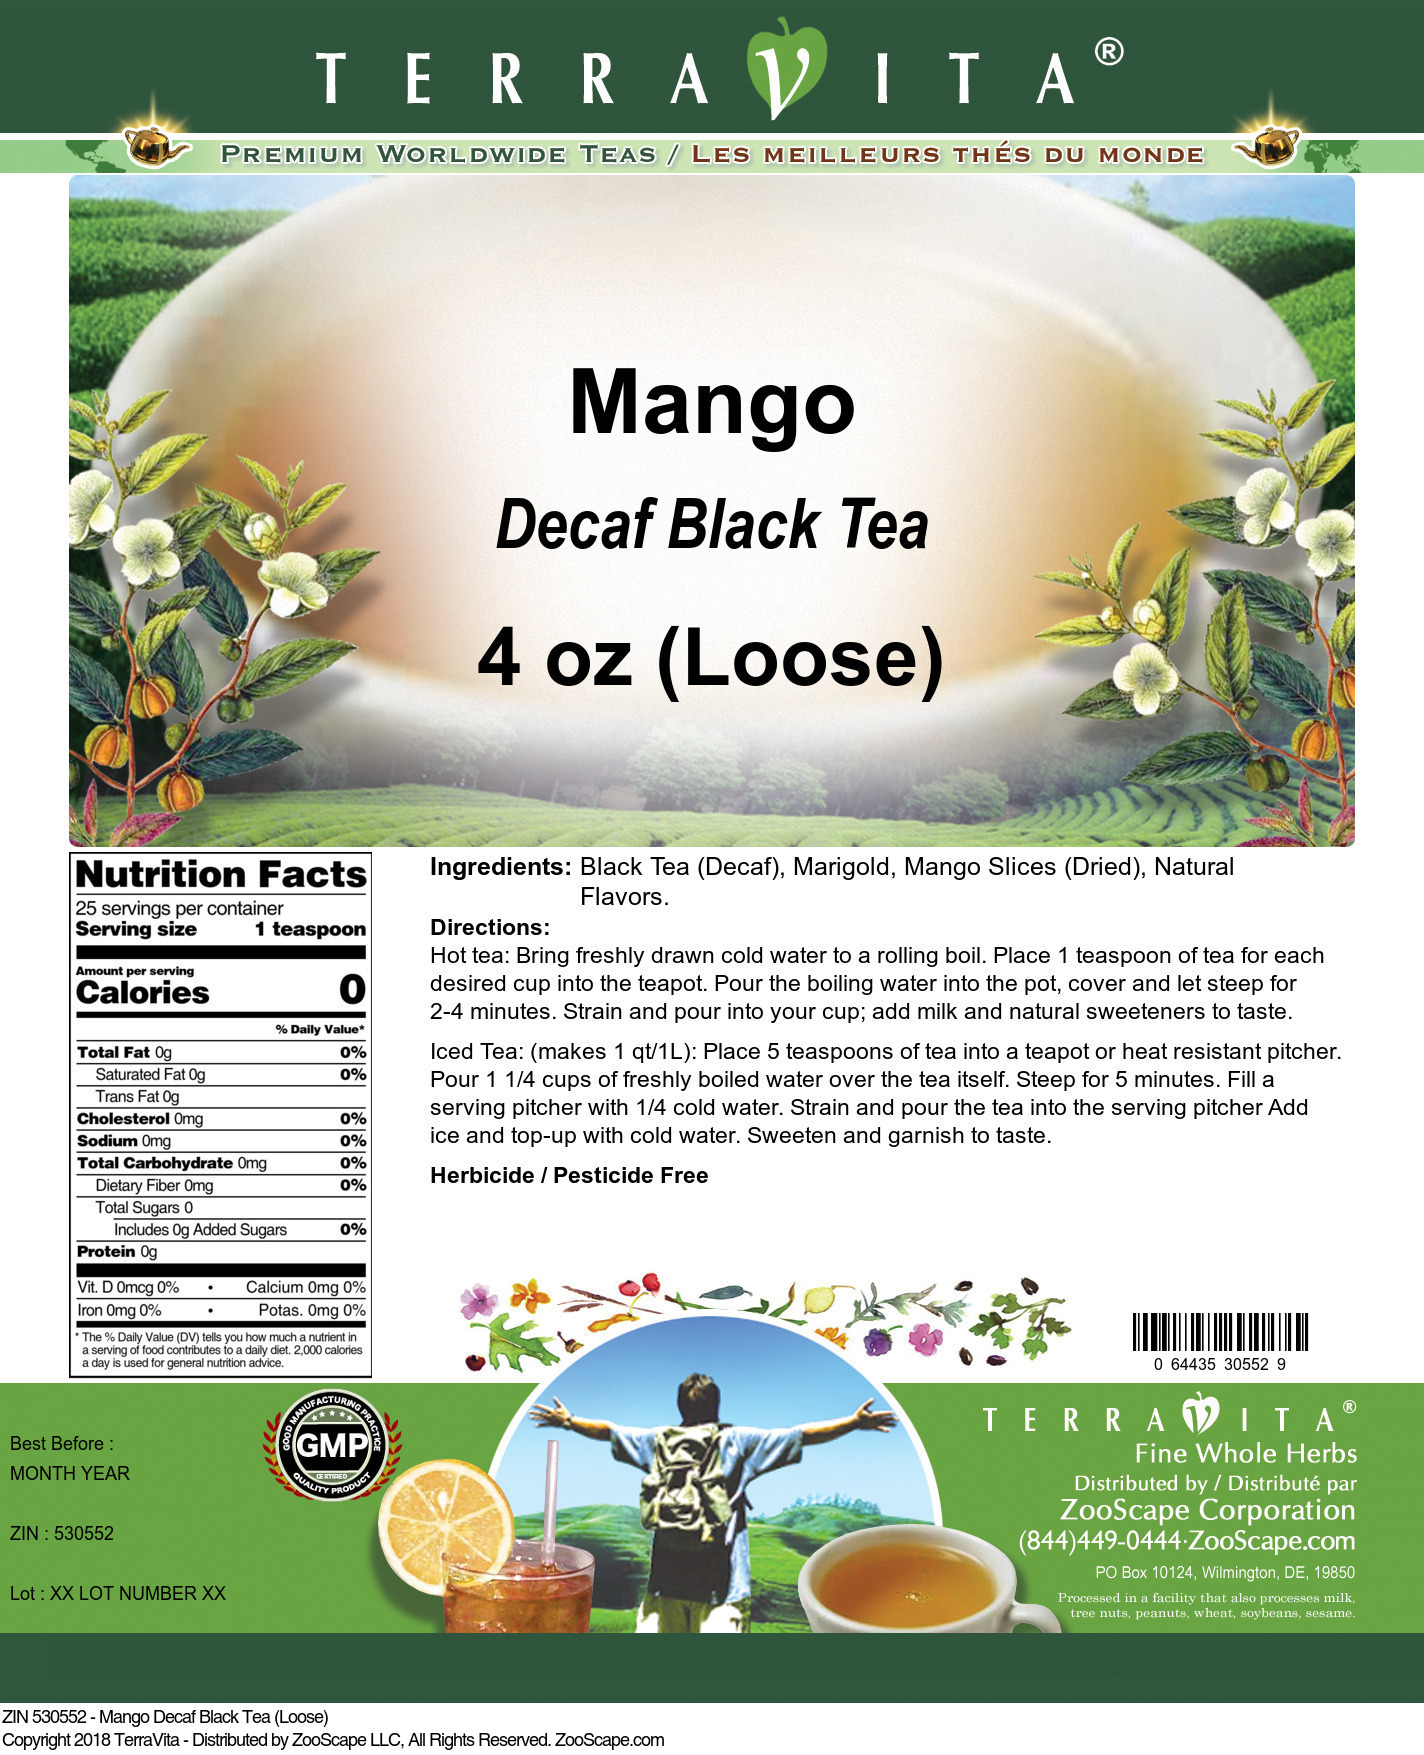 Mango Decaf Black Tea (Loose)